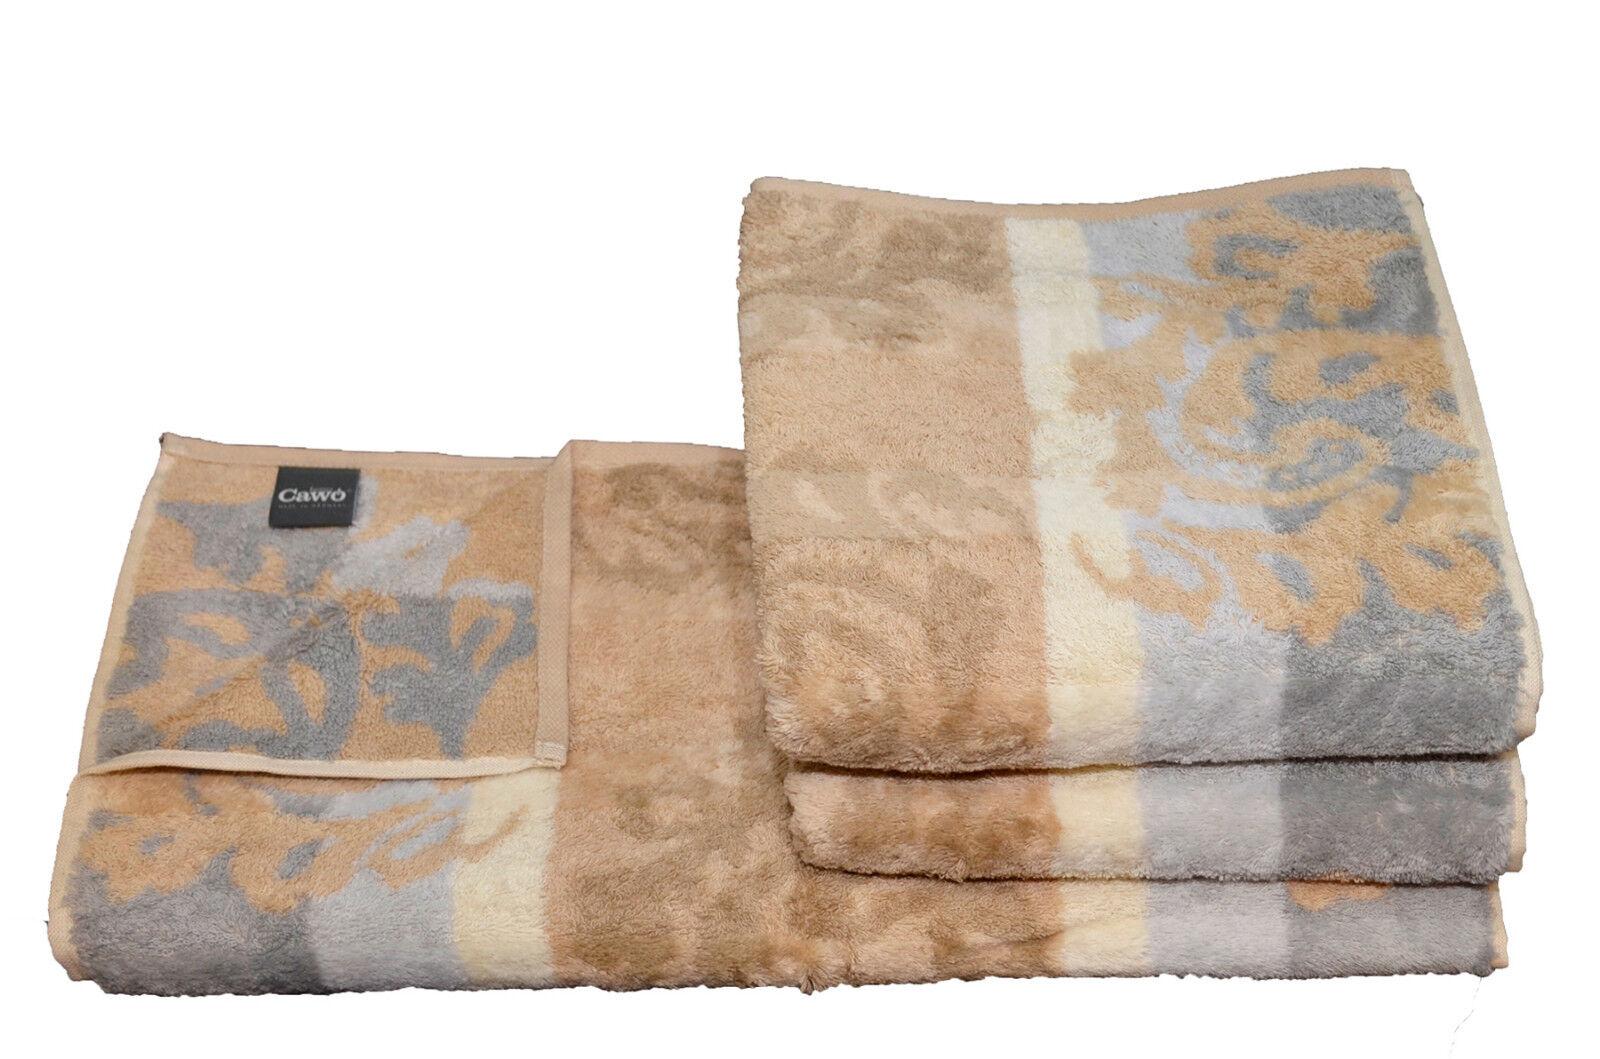 Cawö Noblesse Cashmere Jacquard Set Handtuch Handtücher Duschtuch günstig online | Sorgfältig ausgewählte Materialien